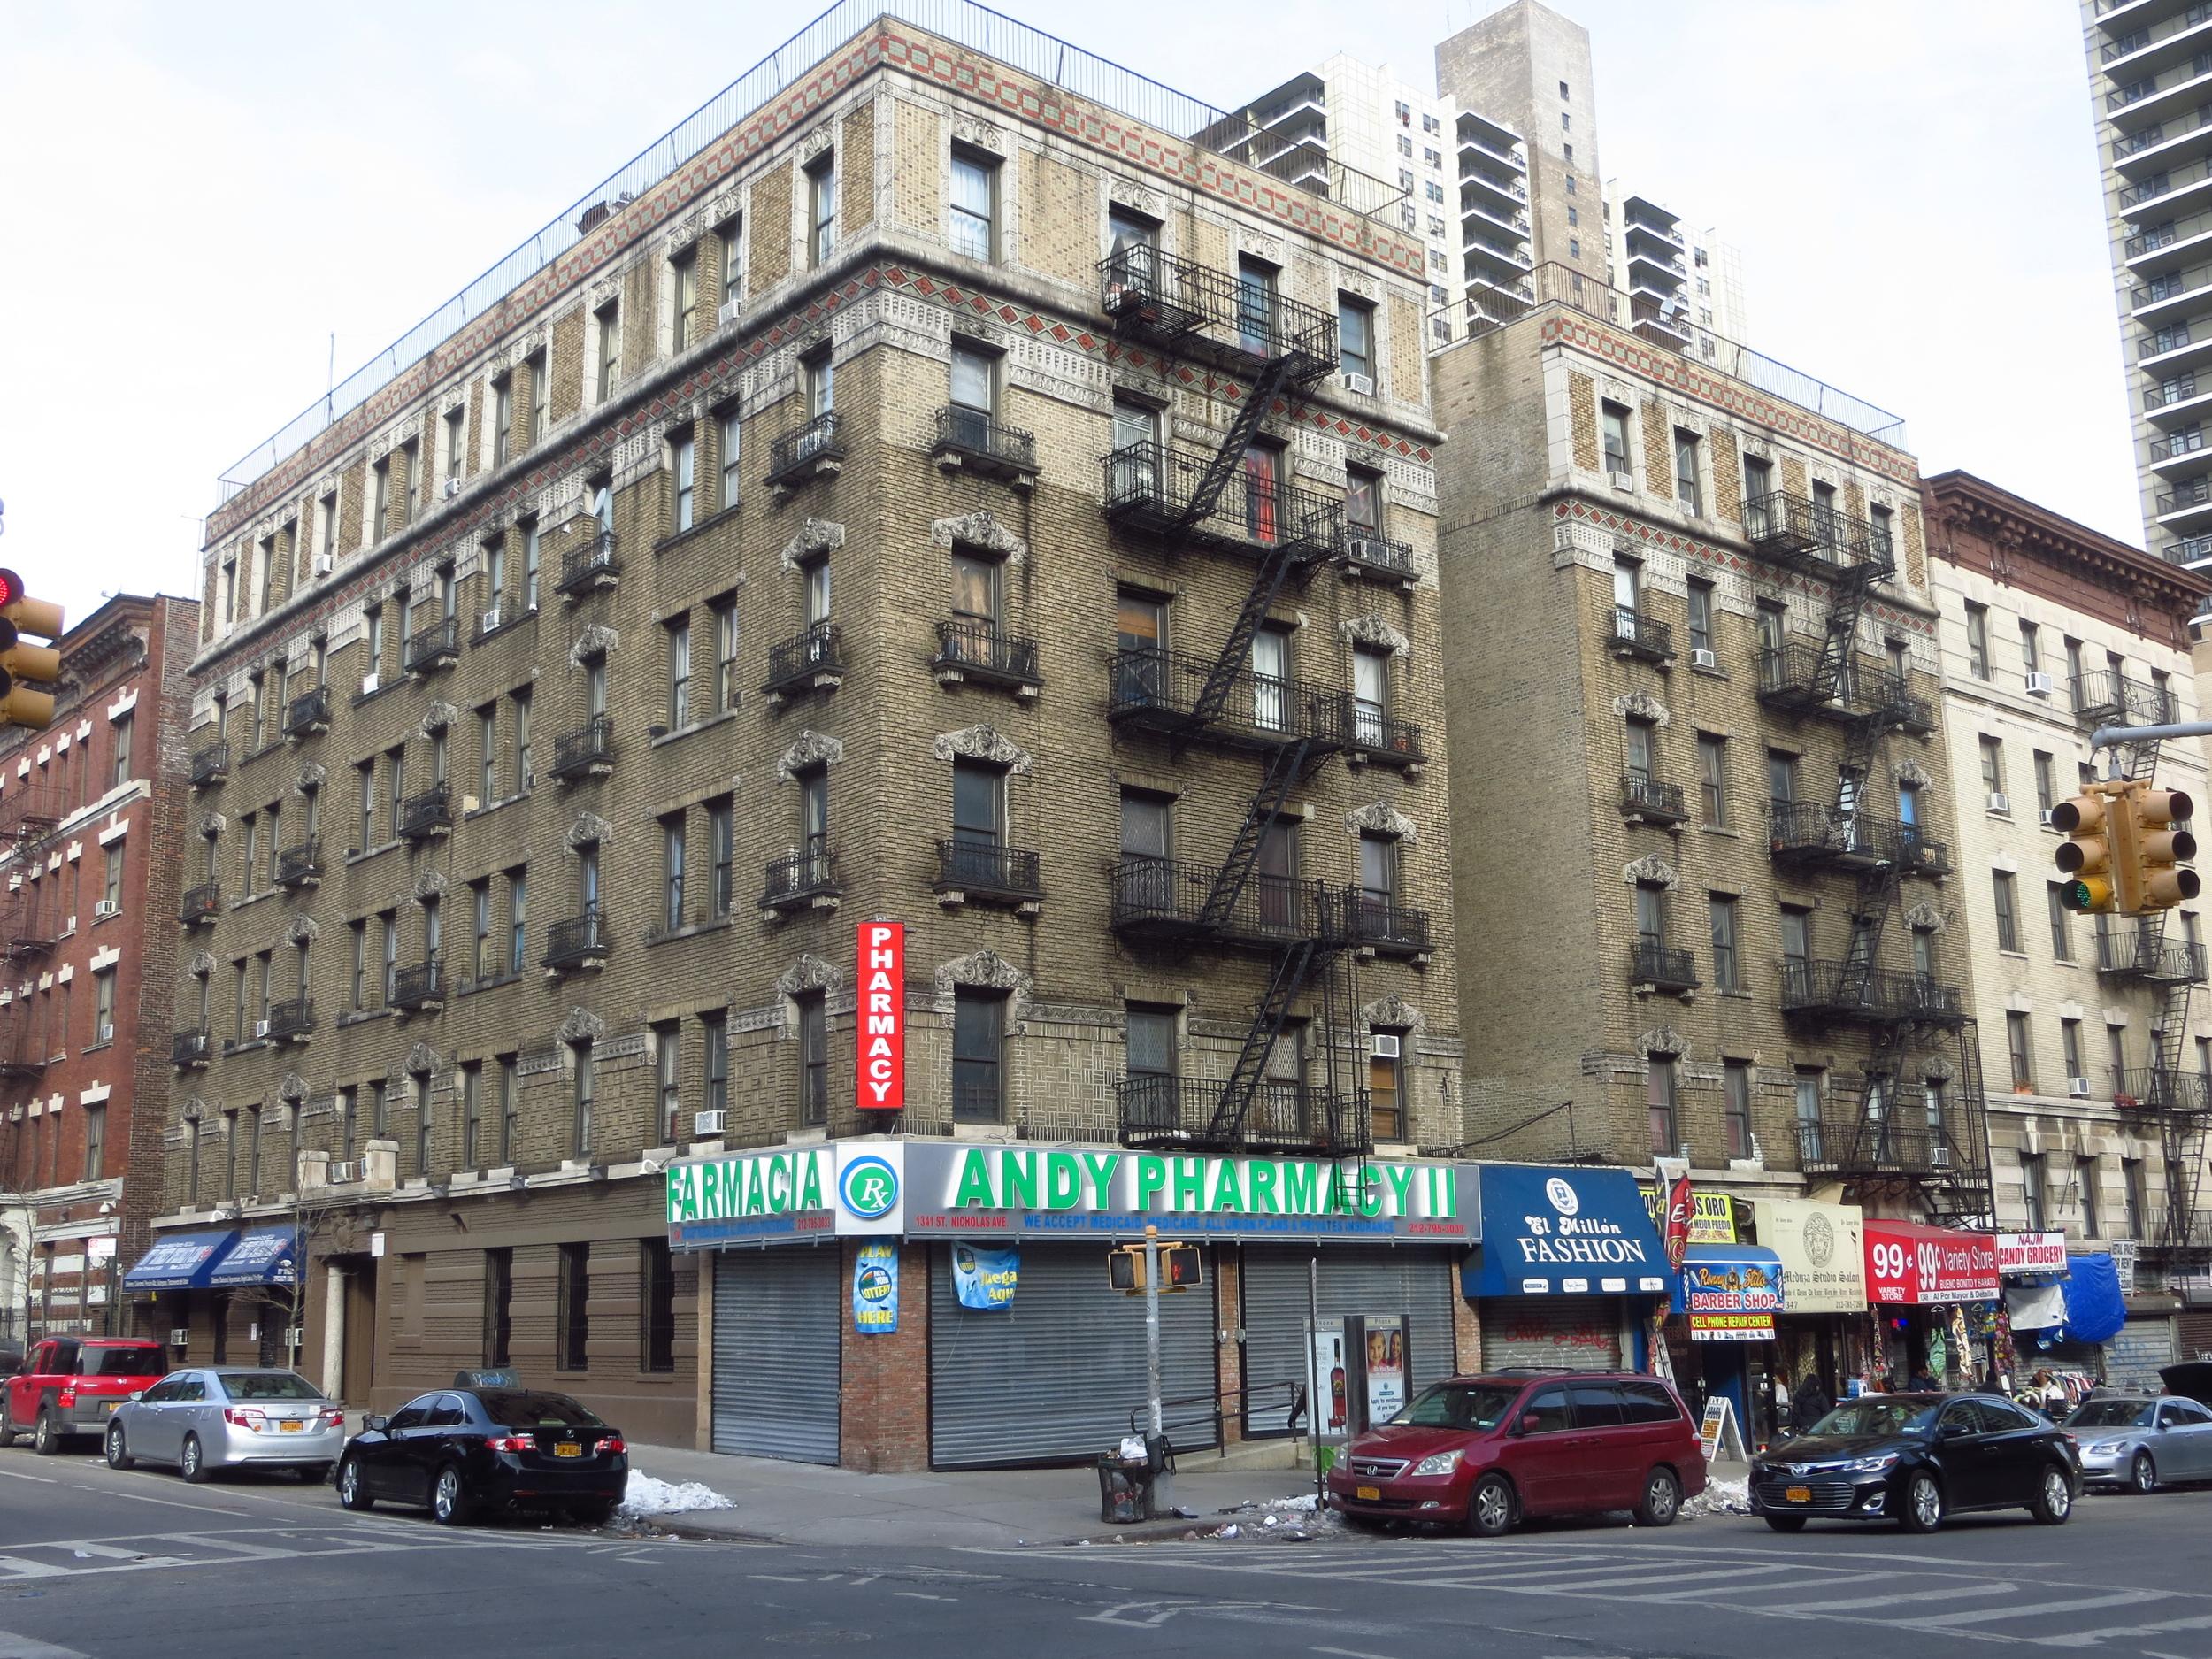 More apartment buildings